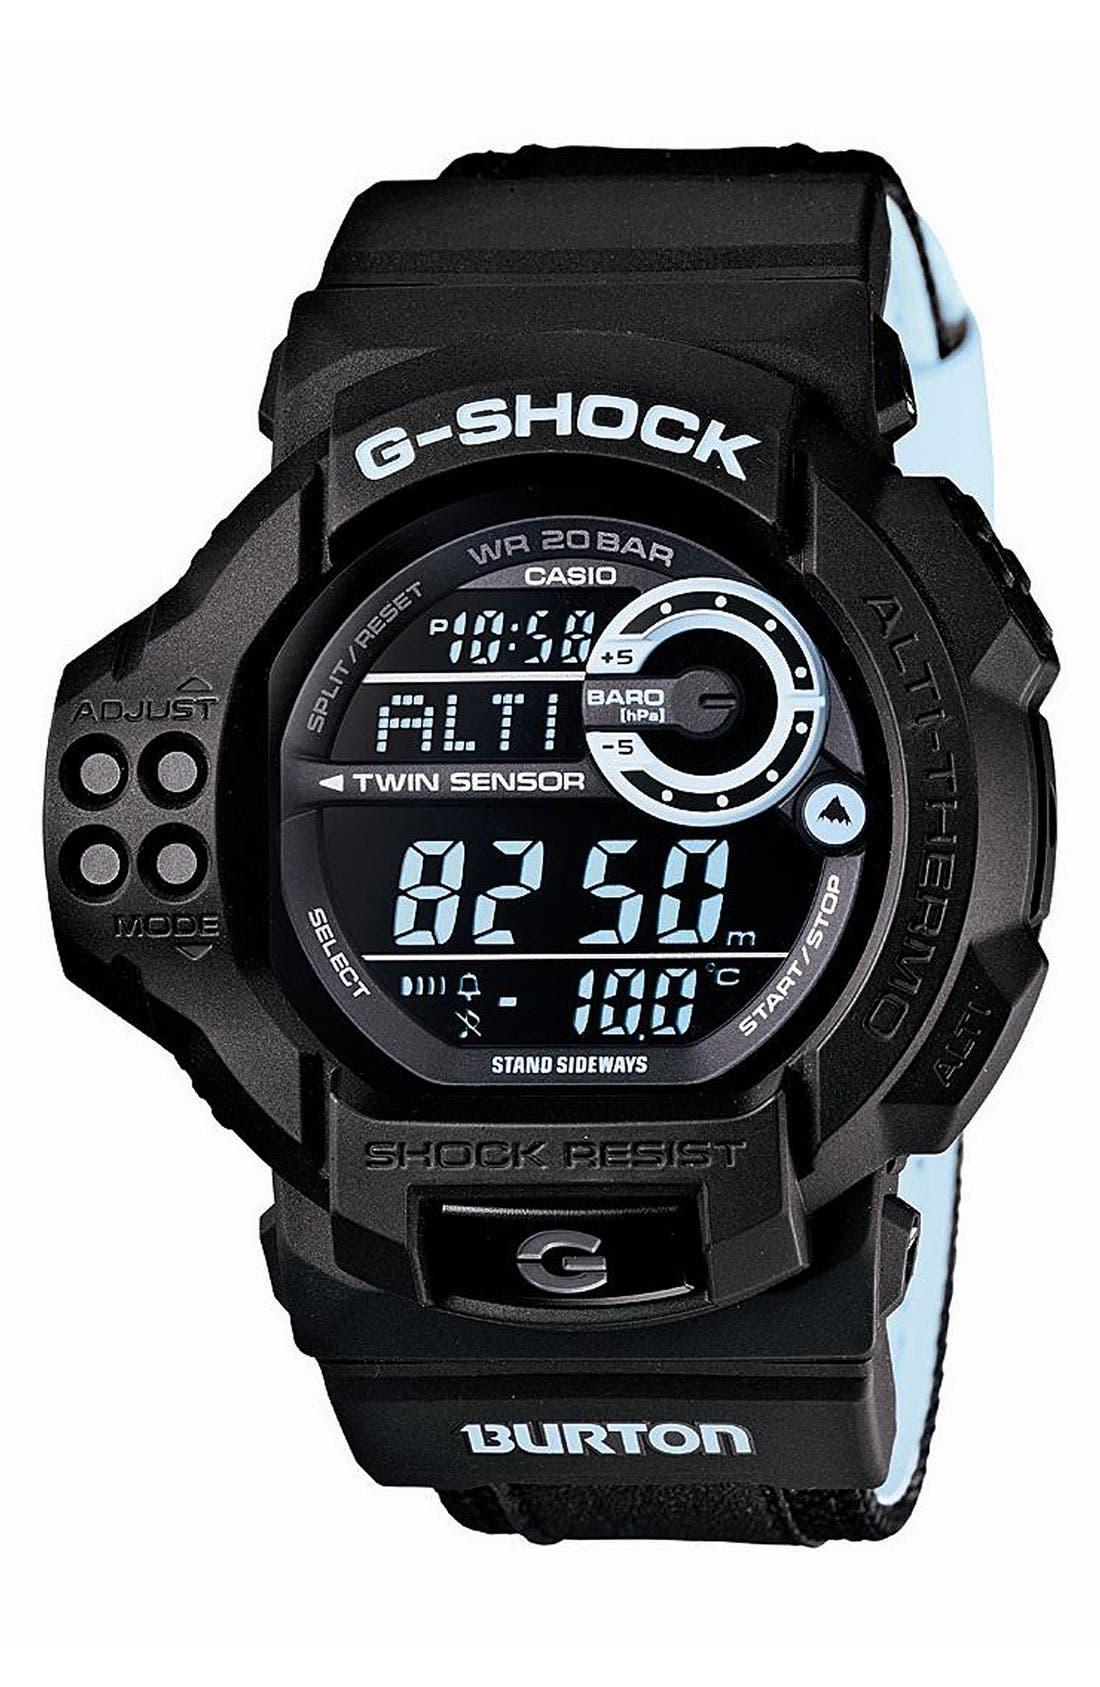 Alternate Image 1 Selected - G-Shock 'Burton' Digital Watch